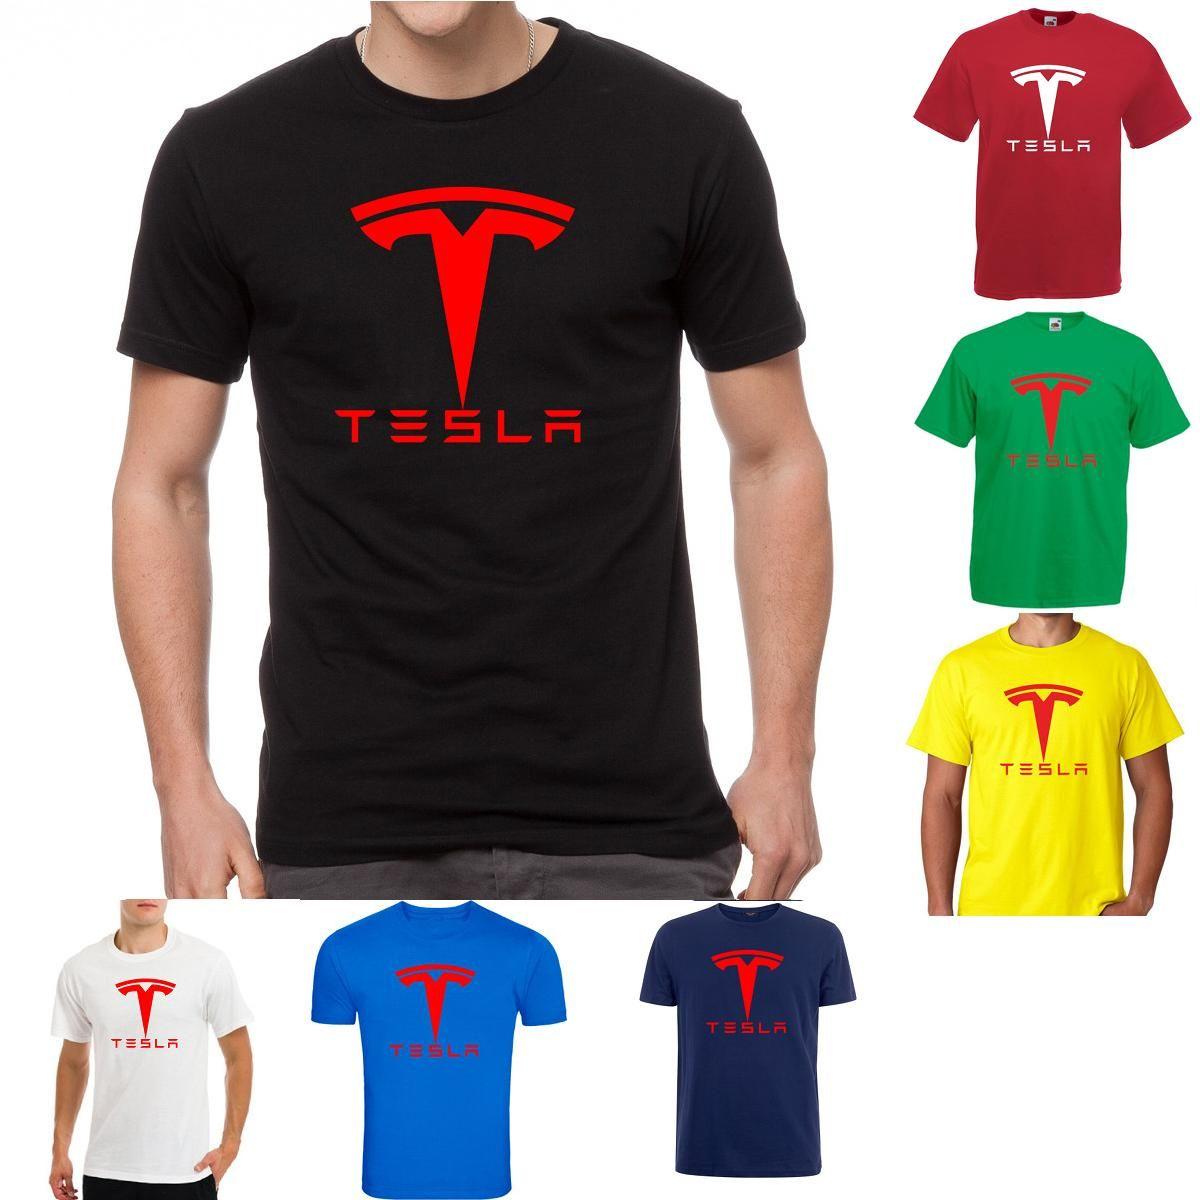 3c58a9791 Tesla Motors Car Elon Musk Fan Moto Rally Electric Nikola Nerd Geek T Shirt  100% Cotton T Shirts Brand Clothing Tops Tees High Quality Novelty Shirts  ...